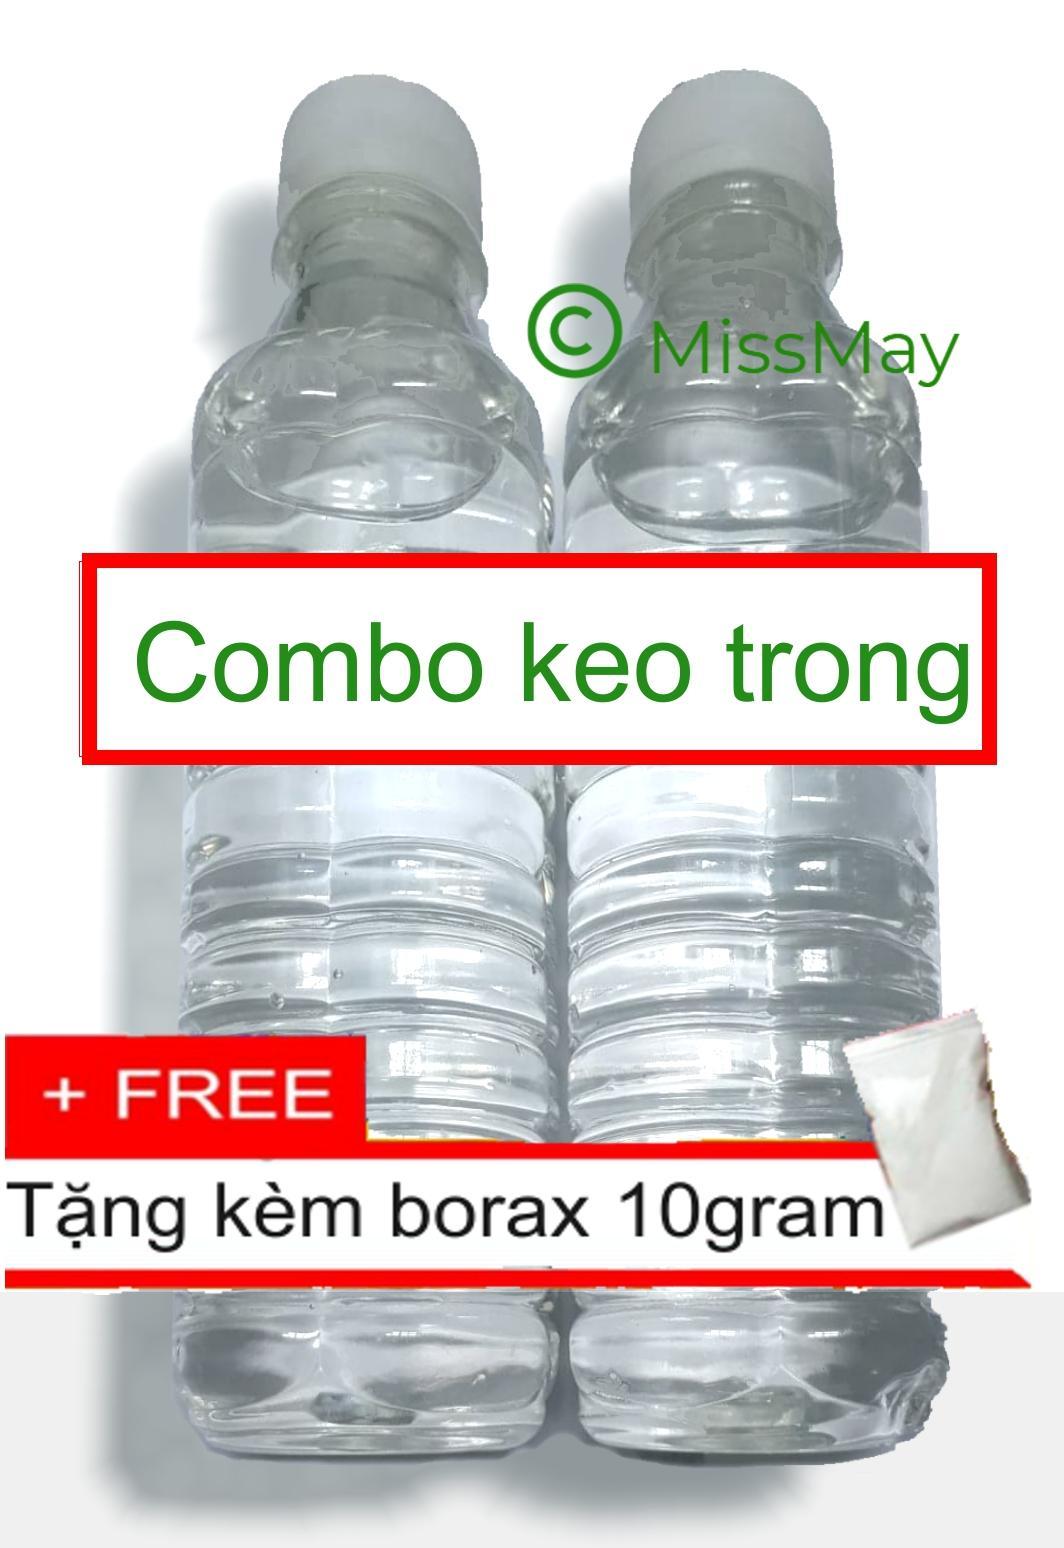 Mua Combo 2 chai keo trong 660ml (nguyên liệu slime trong)